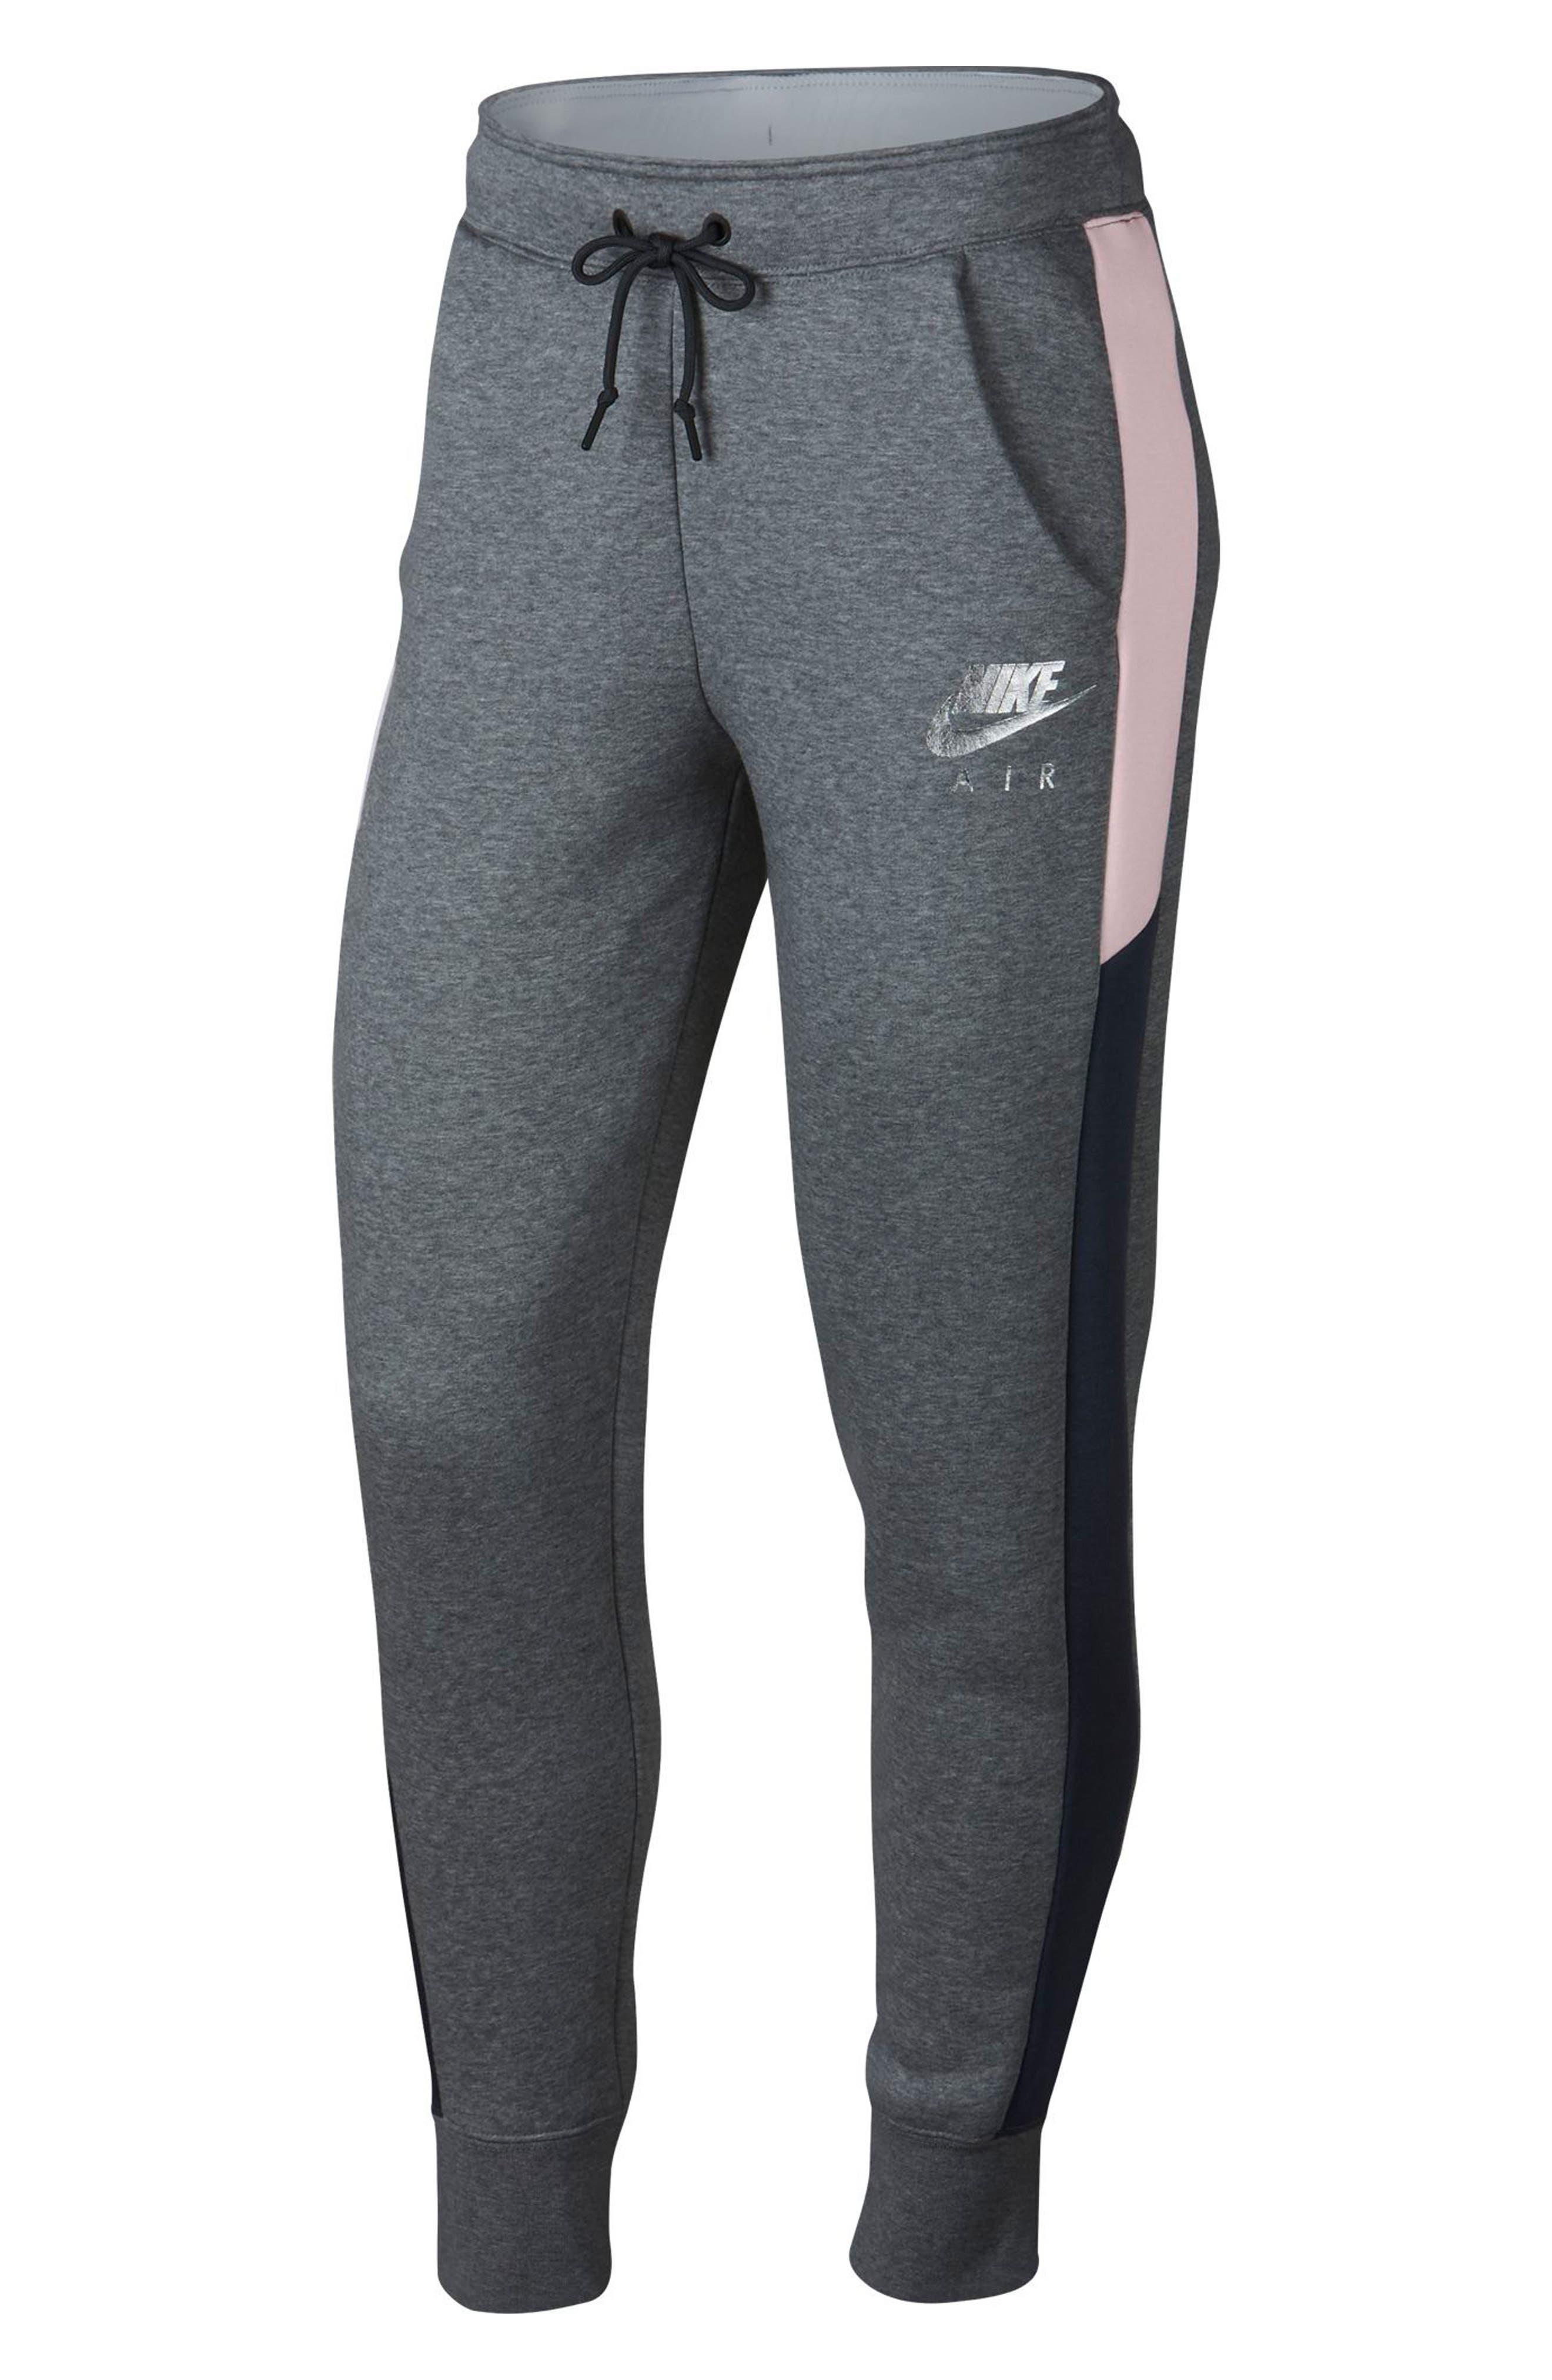 Sportswear Women's Rally Pants,                             Main thumbnail 1, color,                             Carbon Htr/ Obsidian/ Pink